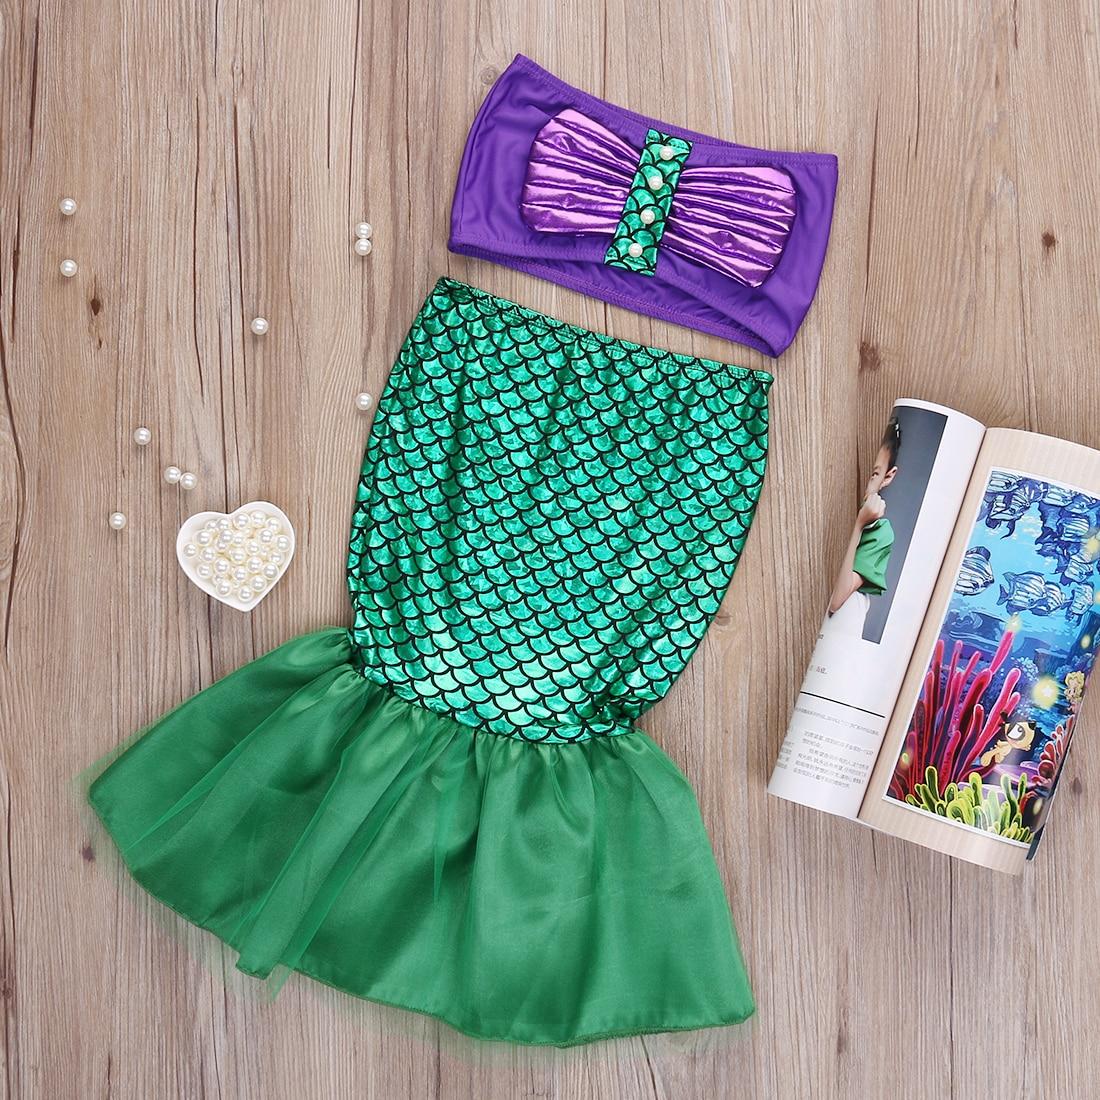 1817132053 Two-piece Cartoon Little Girl Mermaid Swimwear Baby Girls Tail Bikinis Set Costume  Swim-wears Swimming Suit Outfits Dress